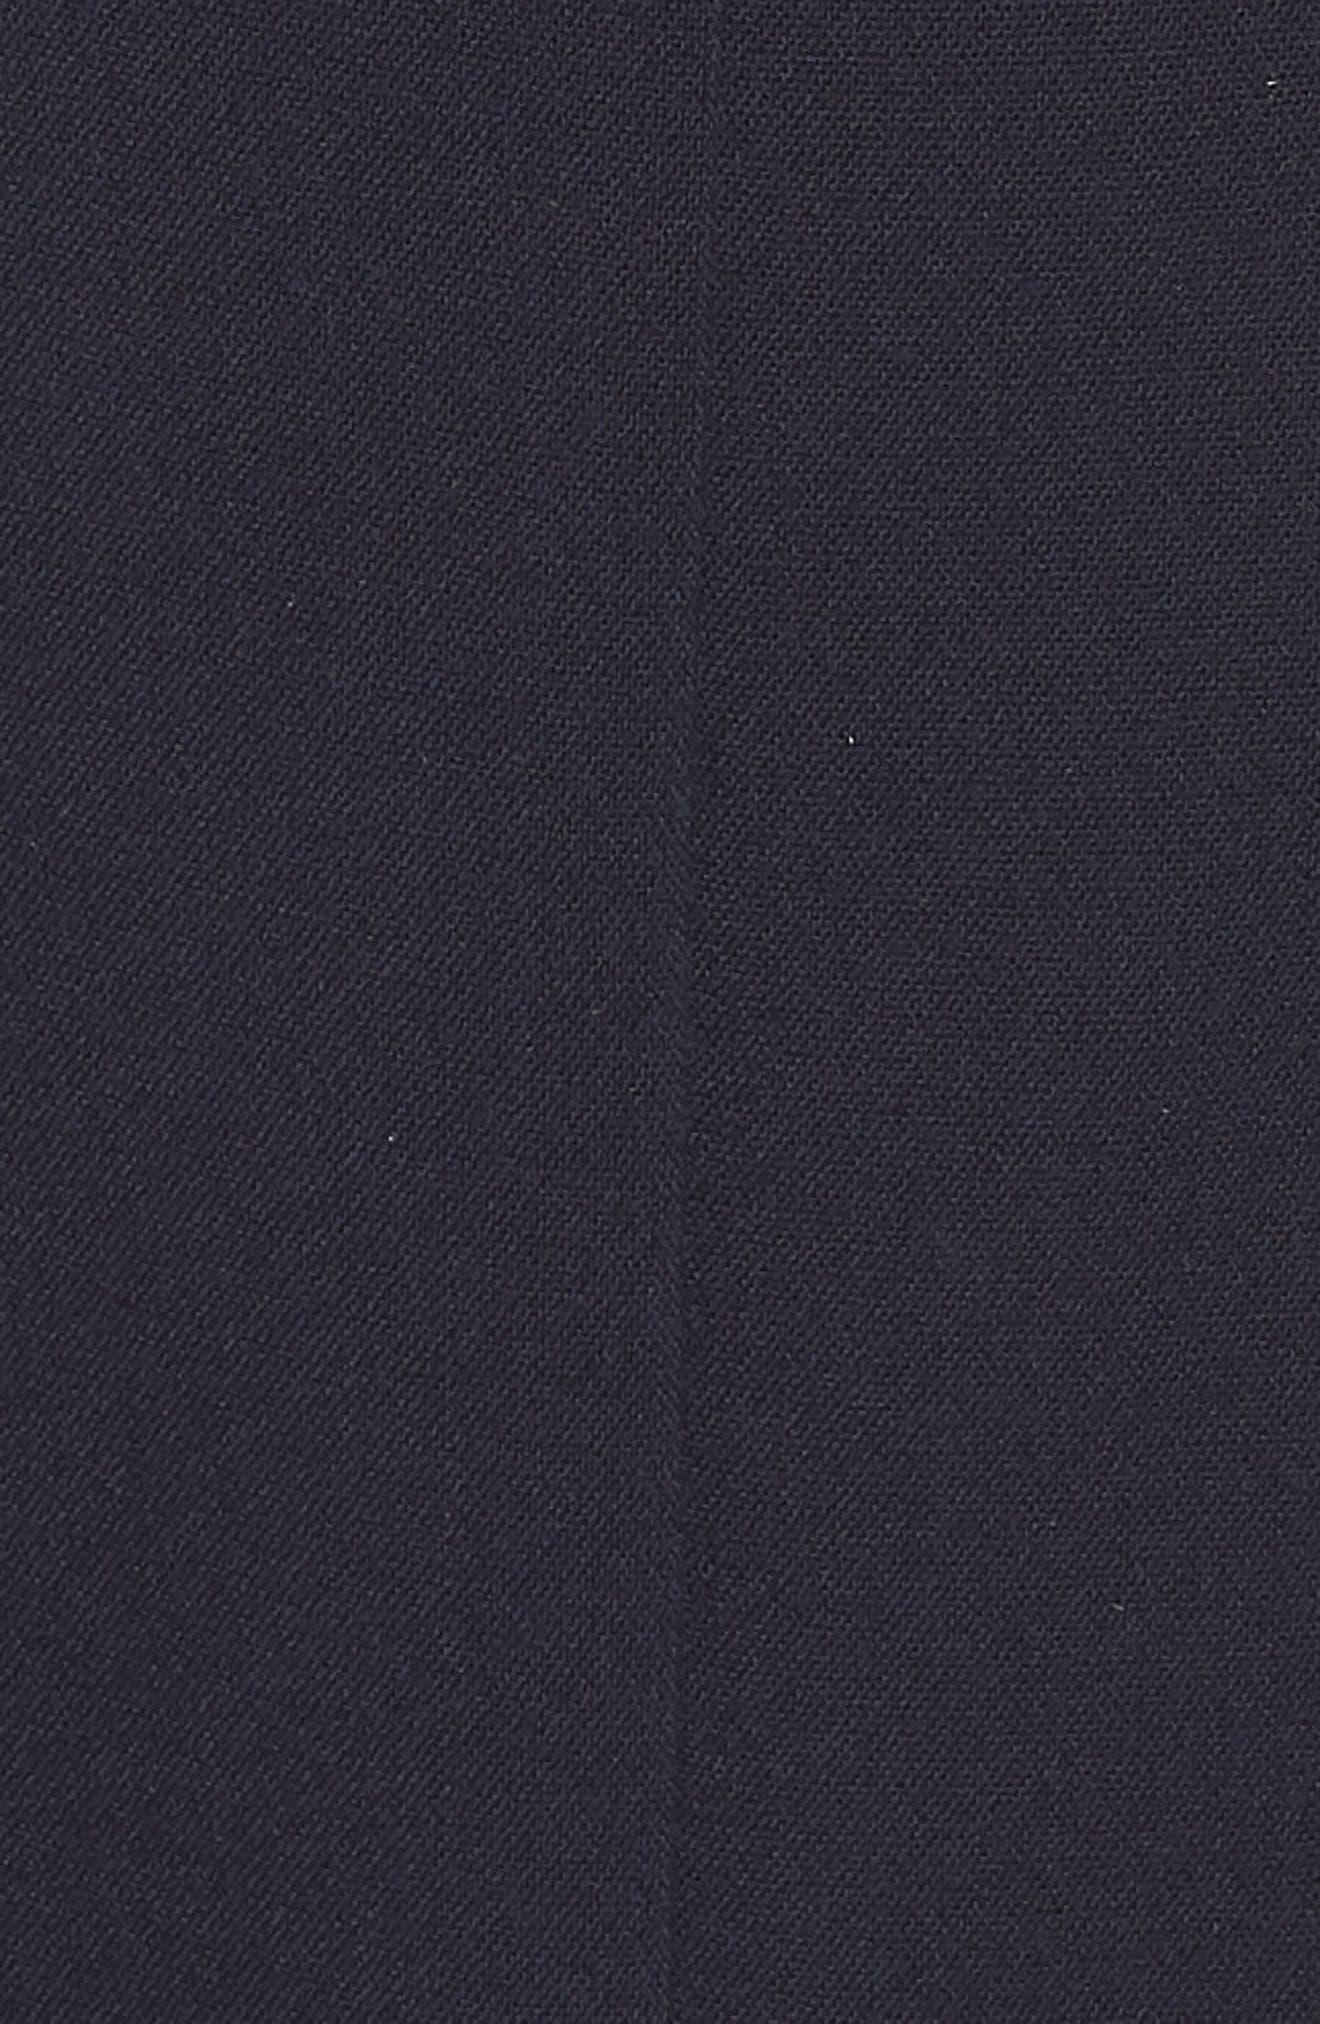 Cap Sleeve Fit & Flare Dress,                             Alternate thumbnail 6, color,                             NAVY